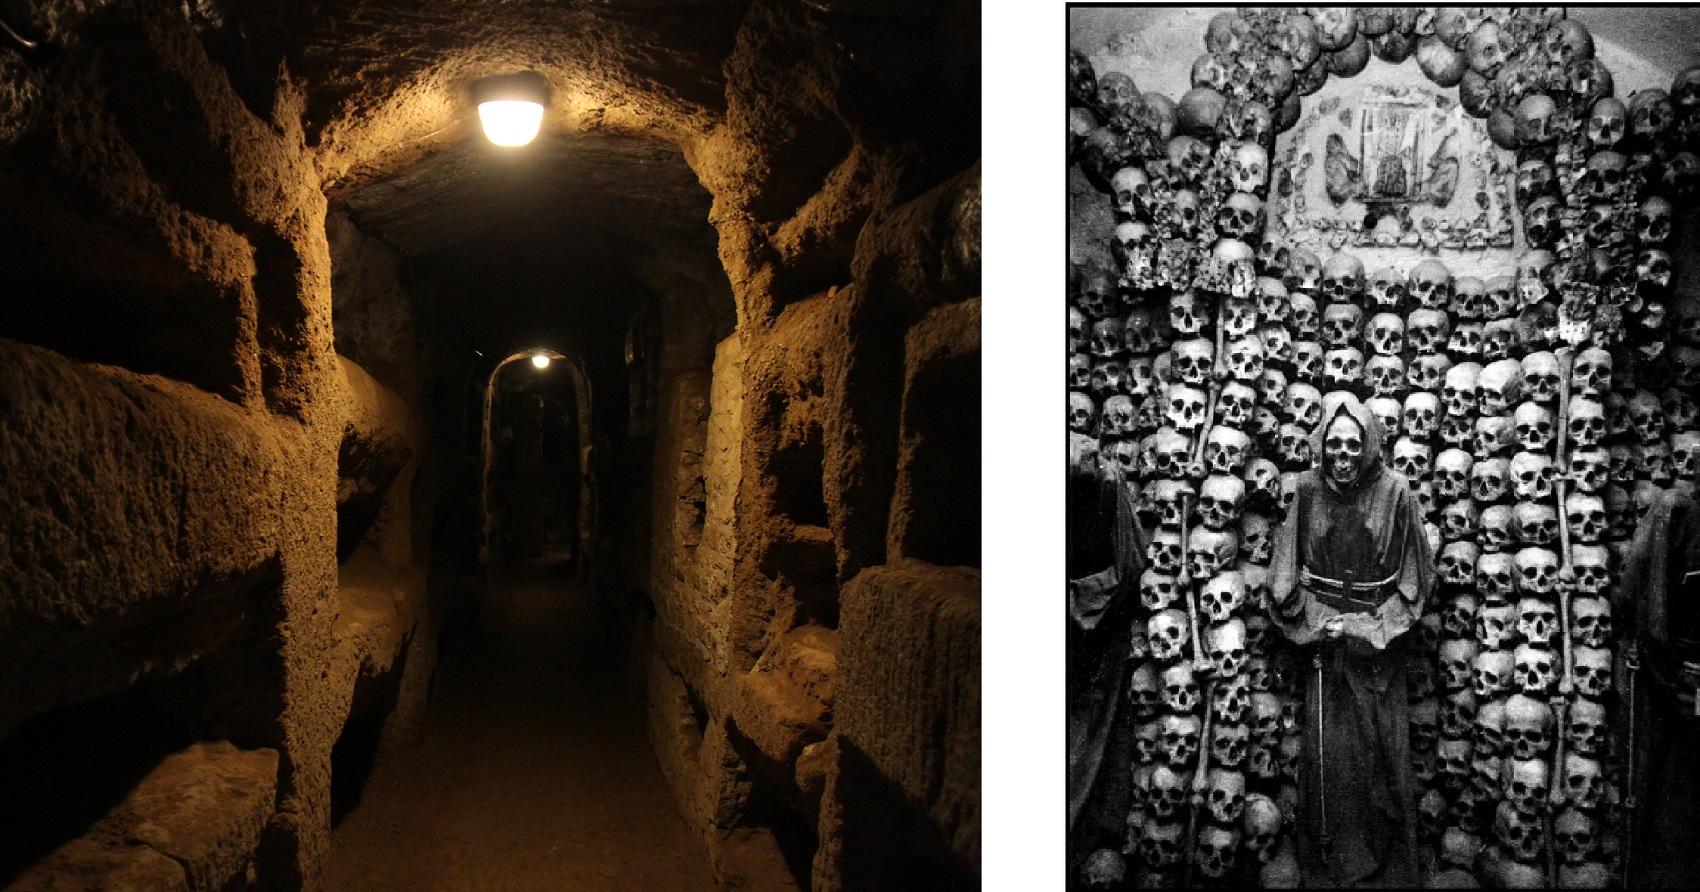 Rome's catacombs Halloween tour